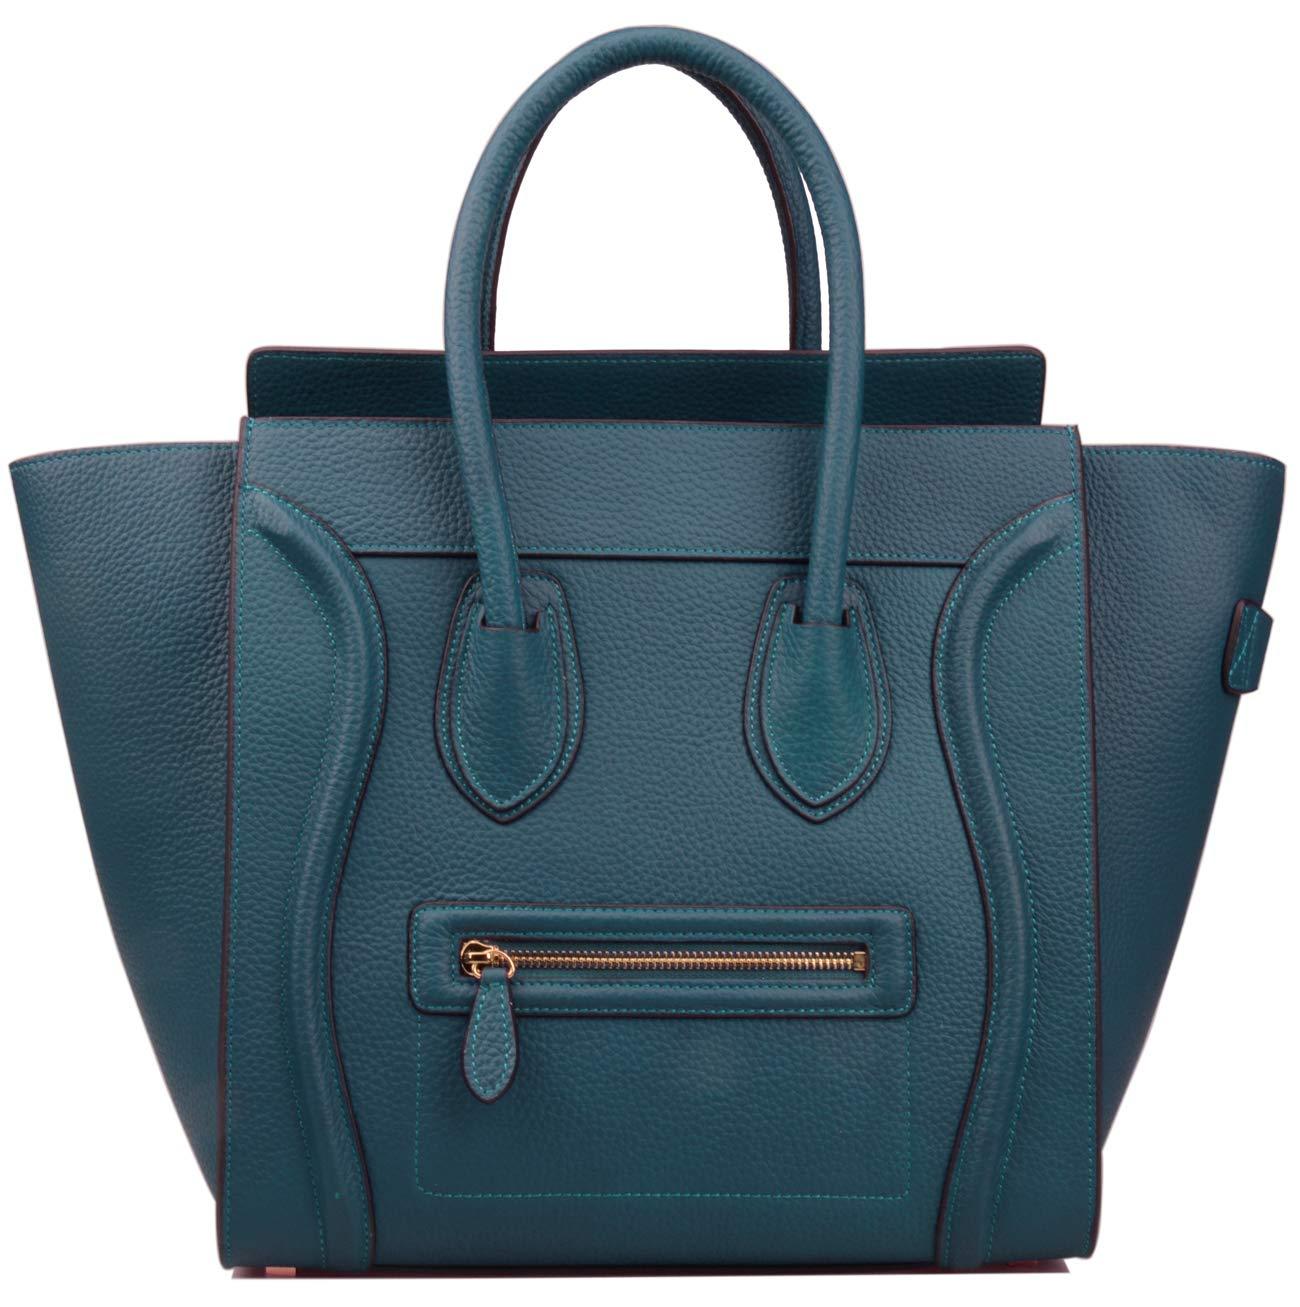 Ainifeel Women's Genuine Leather Smile Large Top Handle Handbag Purse (Large, Peacock blue)